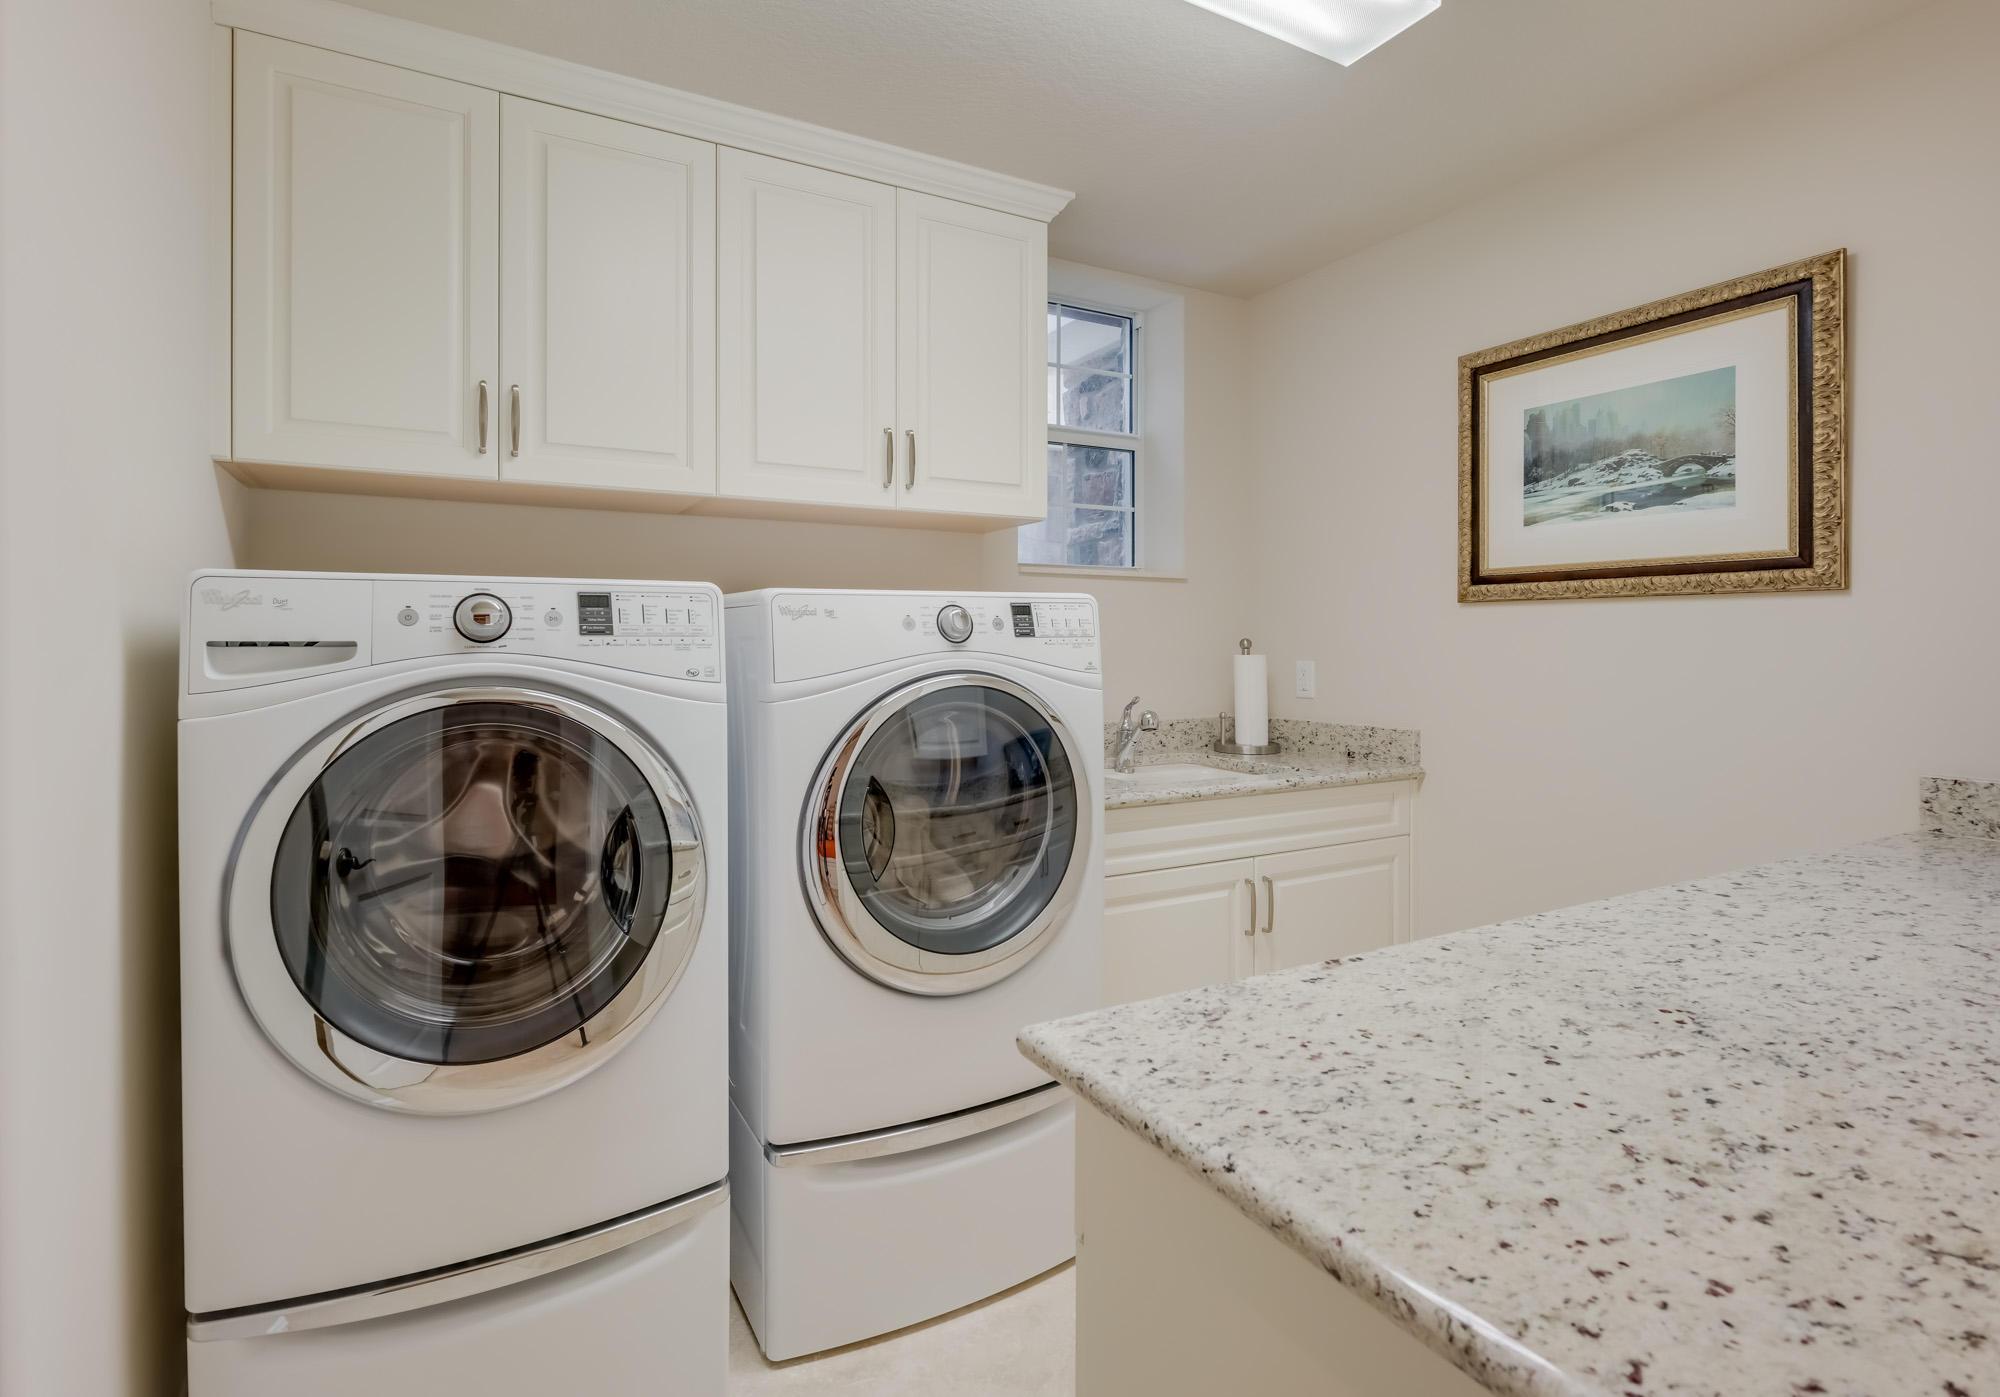 141 Sonata Drive, Jupiter, Florida 33478, 6 Bedrooms Bedrooms, ,5 BathroomsBathrooms,A,Single family,Sonata,RX-10466965